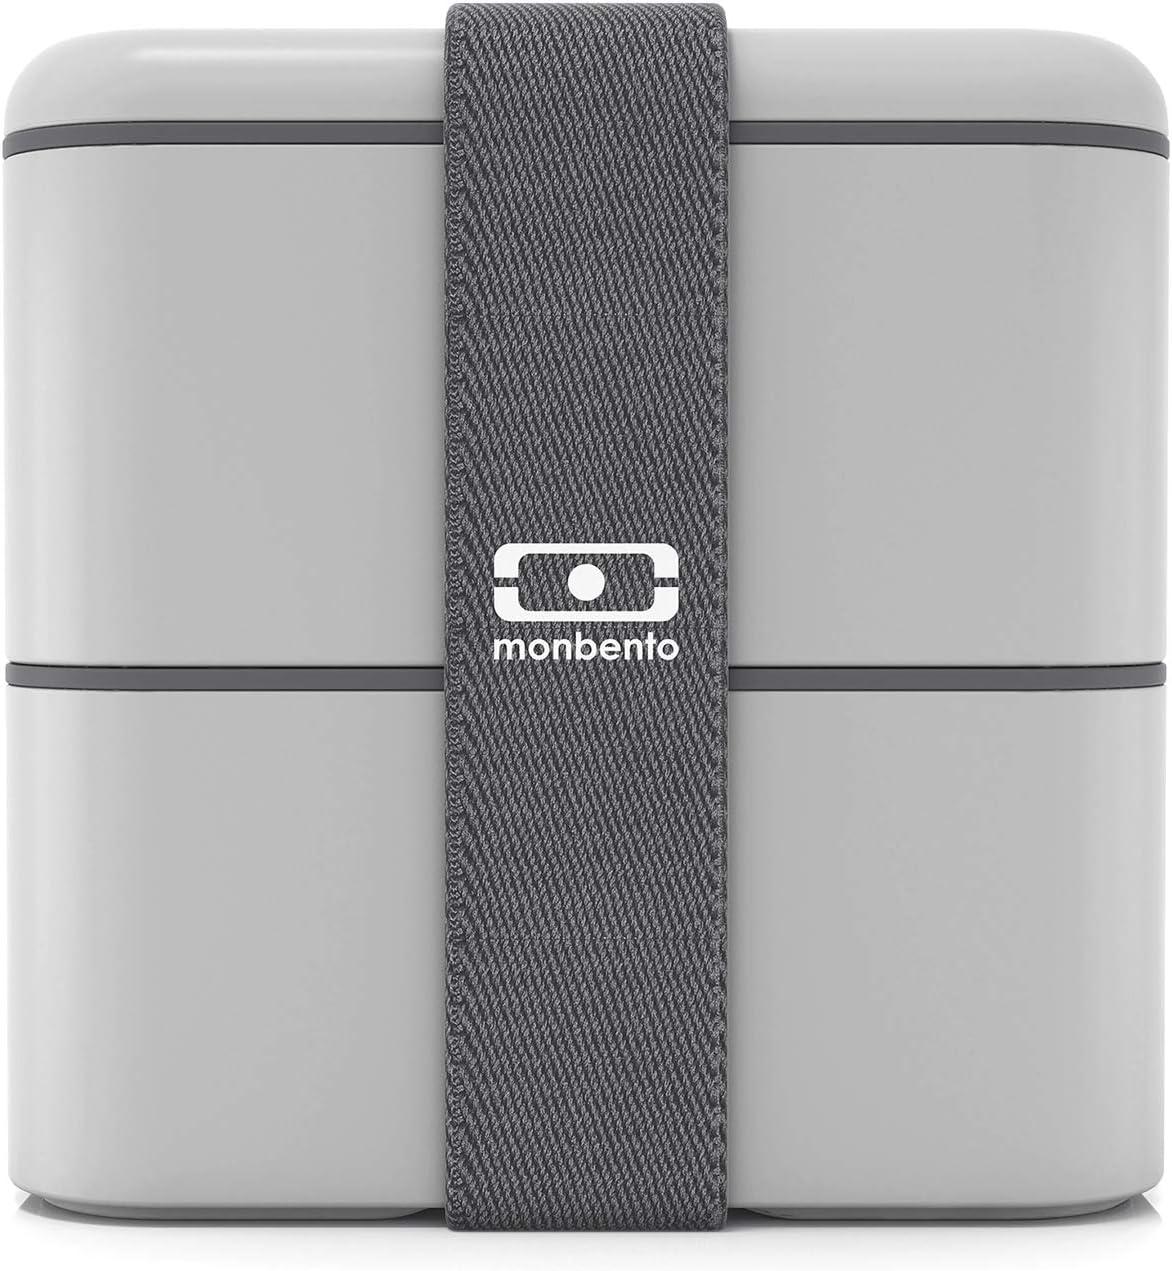 monbento - MB Square Gris Coton Fiambrera Lunch Box - Bento Box ...